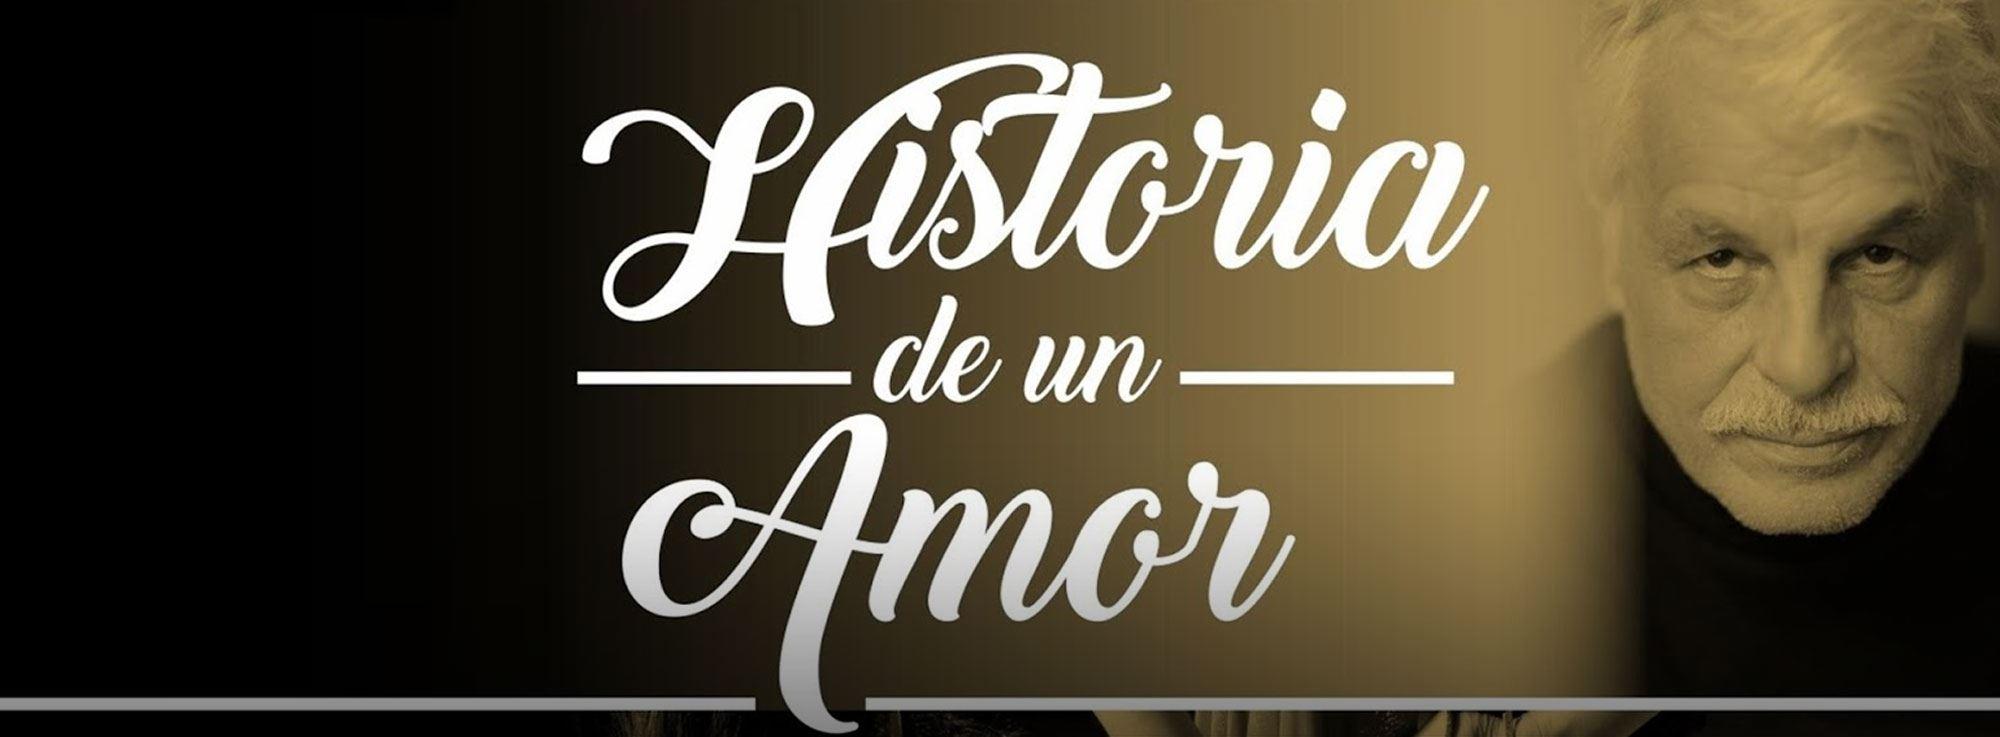 Bisceglie: Historia de un amor